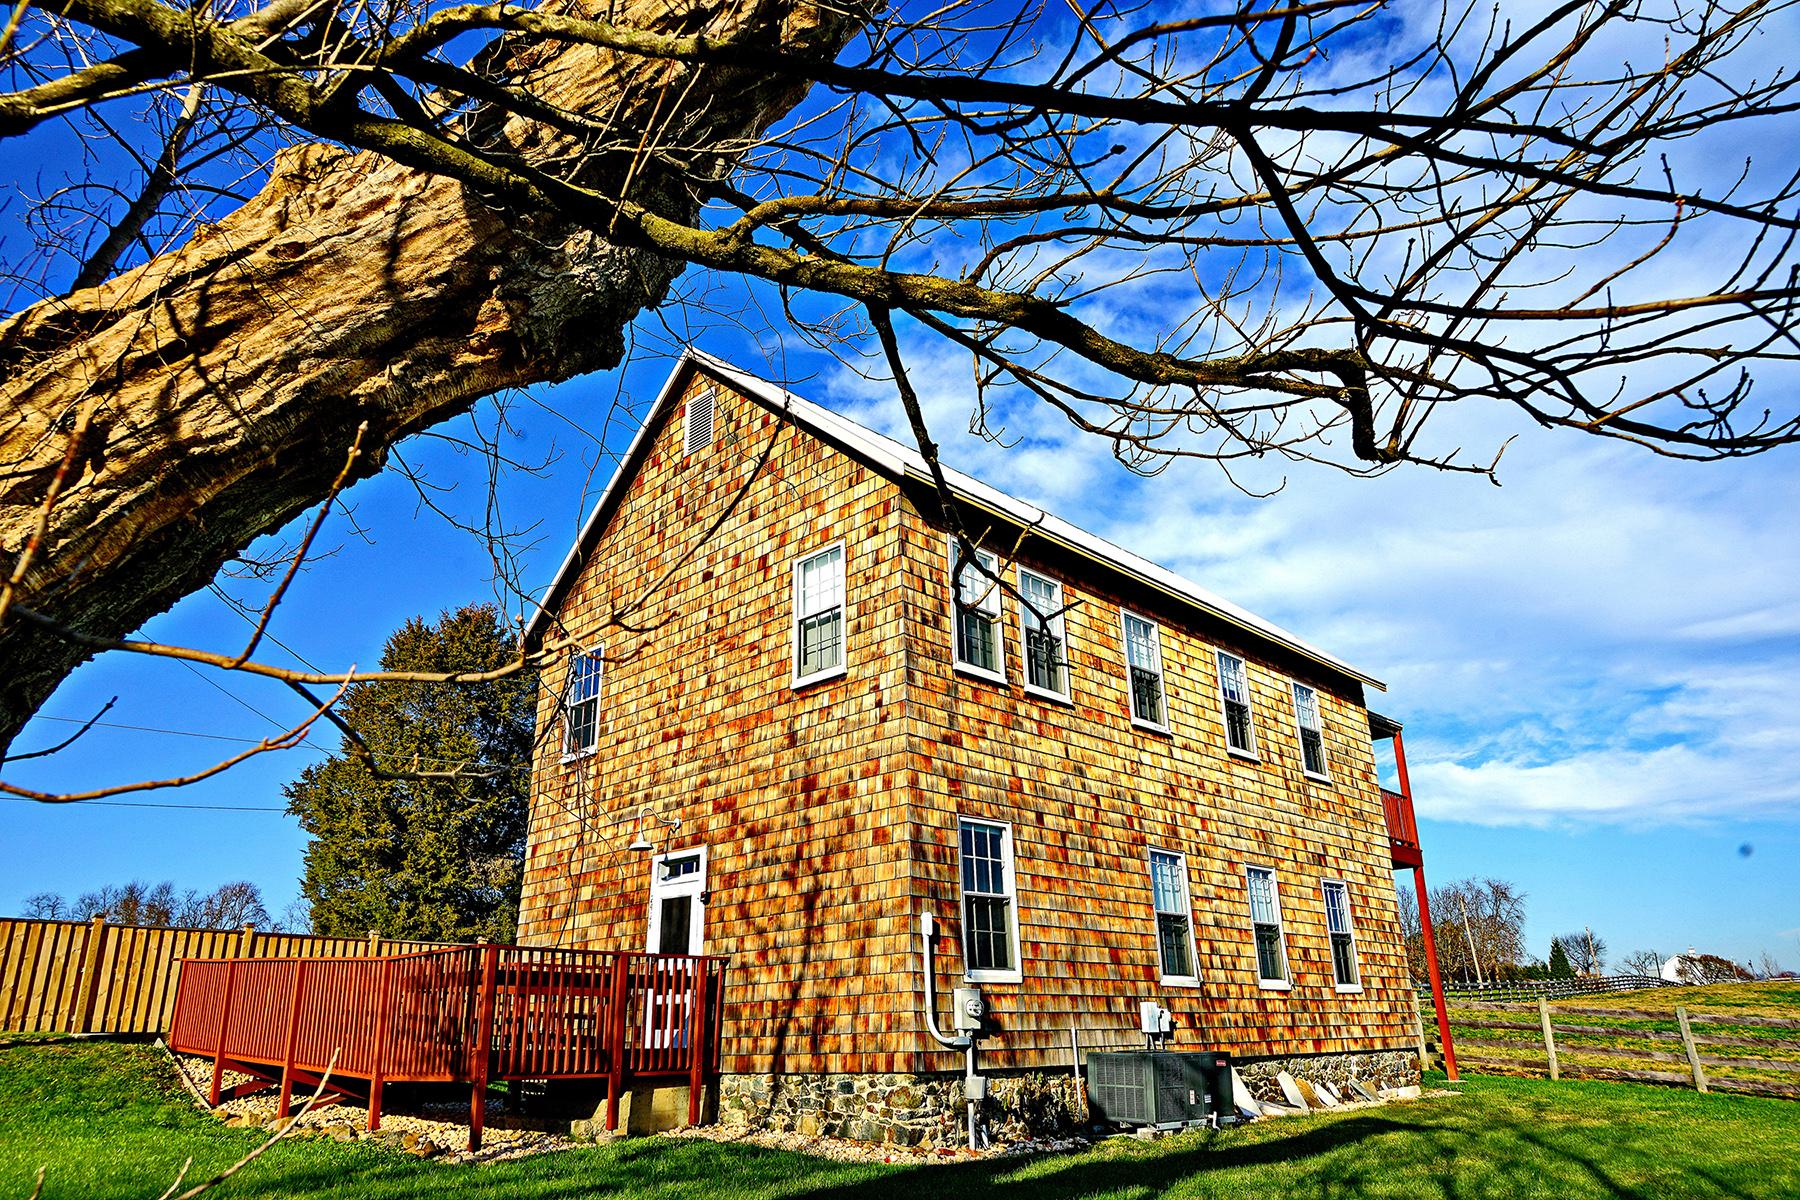 Hosanna School Museum - first Freedmen's Bureau School in Harford County